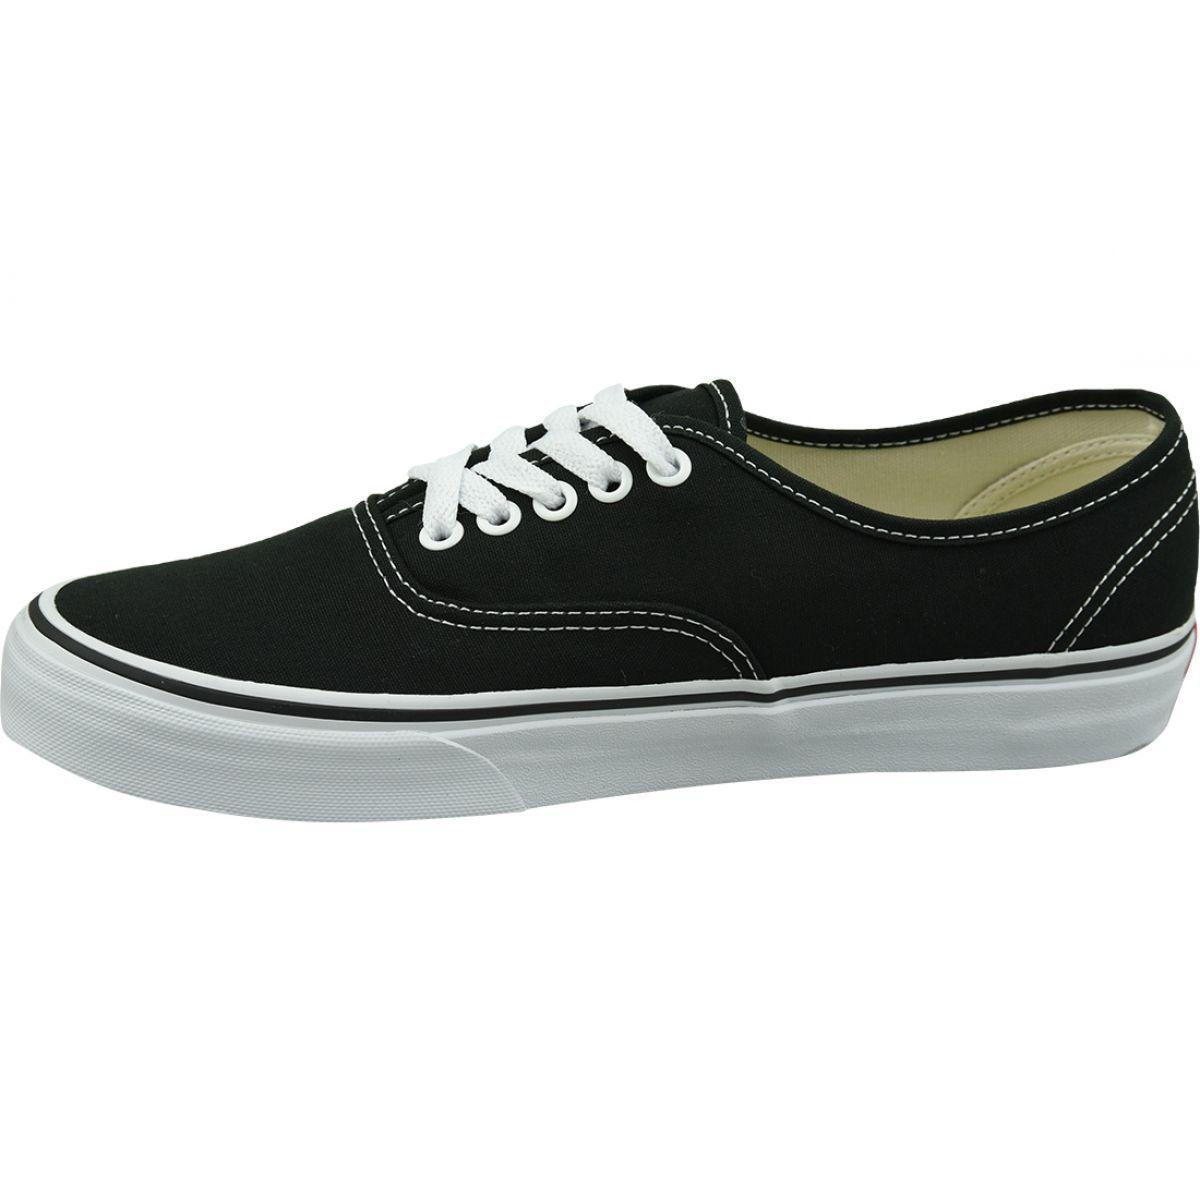 Buty Vans Authentic W Vee3blk Czarne Vans Black Shoes Vans Authentic